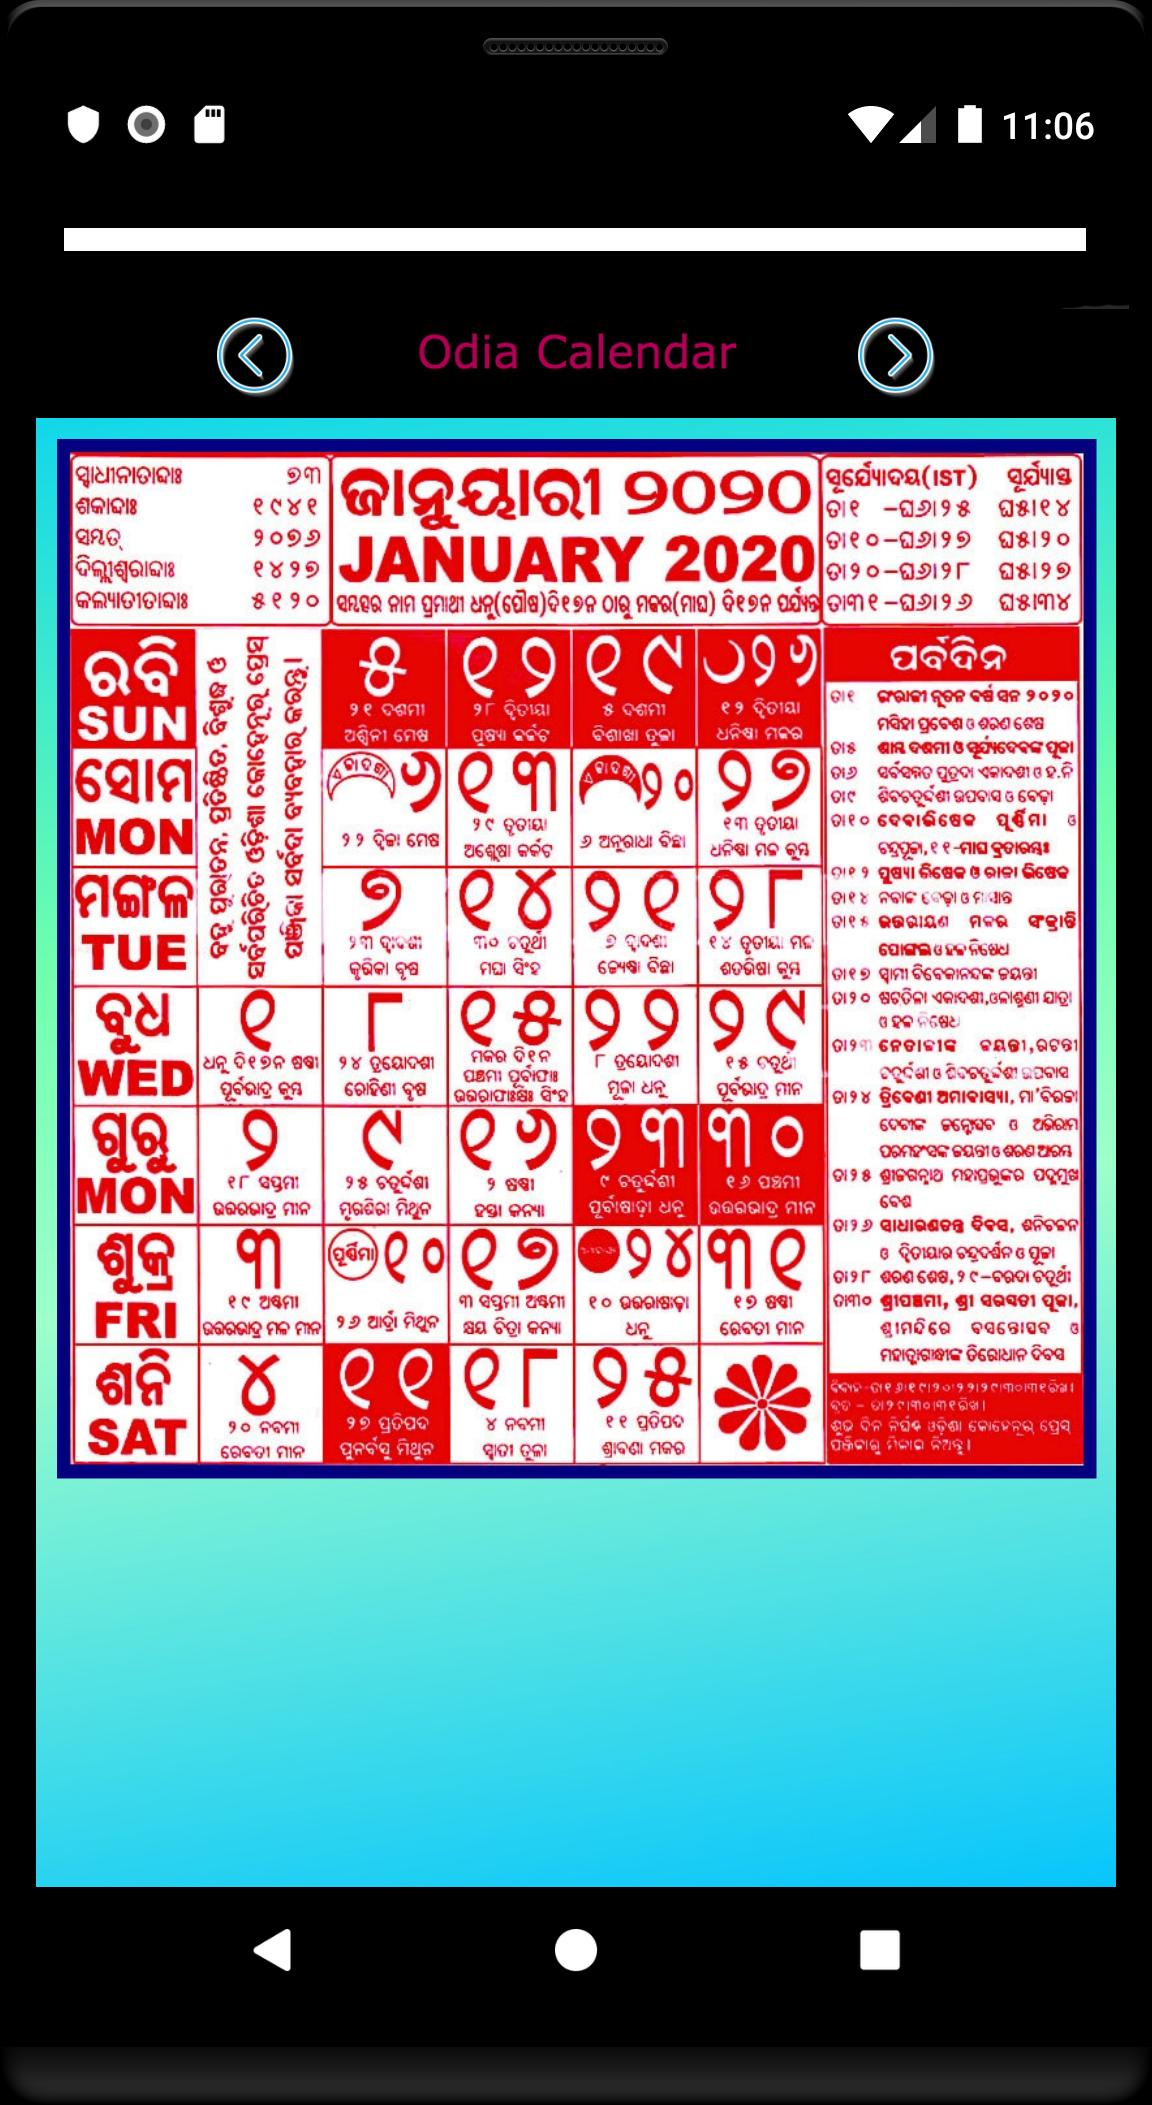 Odia Calendar 2020 Для Андроид  Скачать Apk regarding 2020 Oriya Calendar